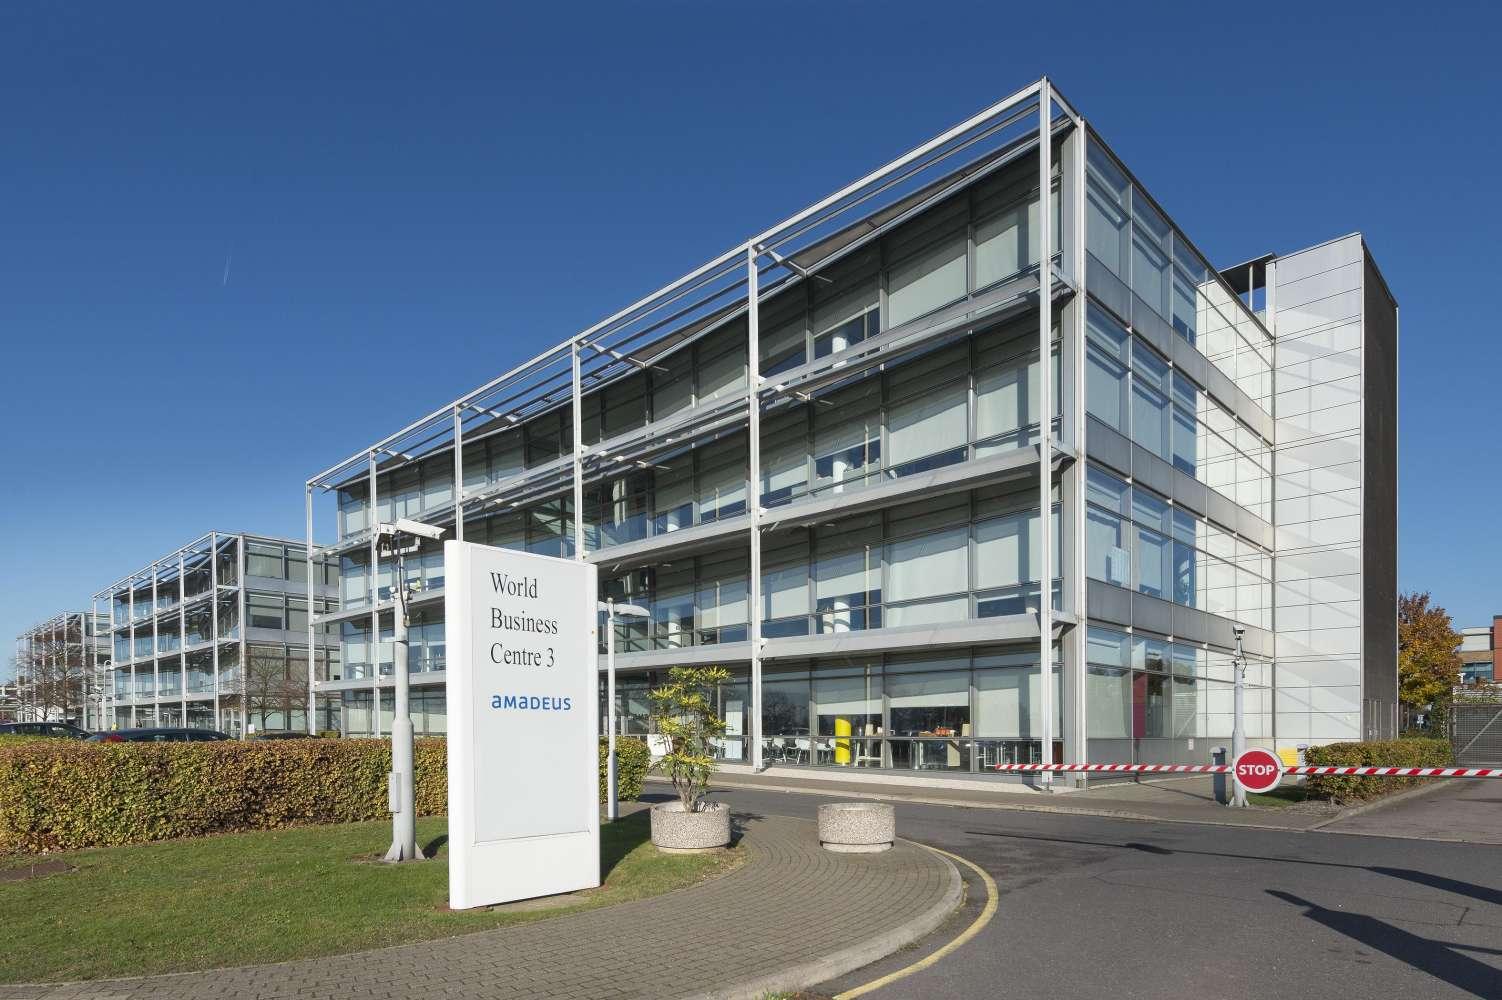 Rent, 3 World Business Centre, Hounslow, TW6 2SF | JLL